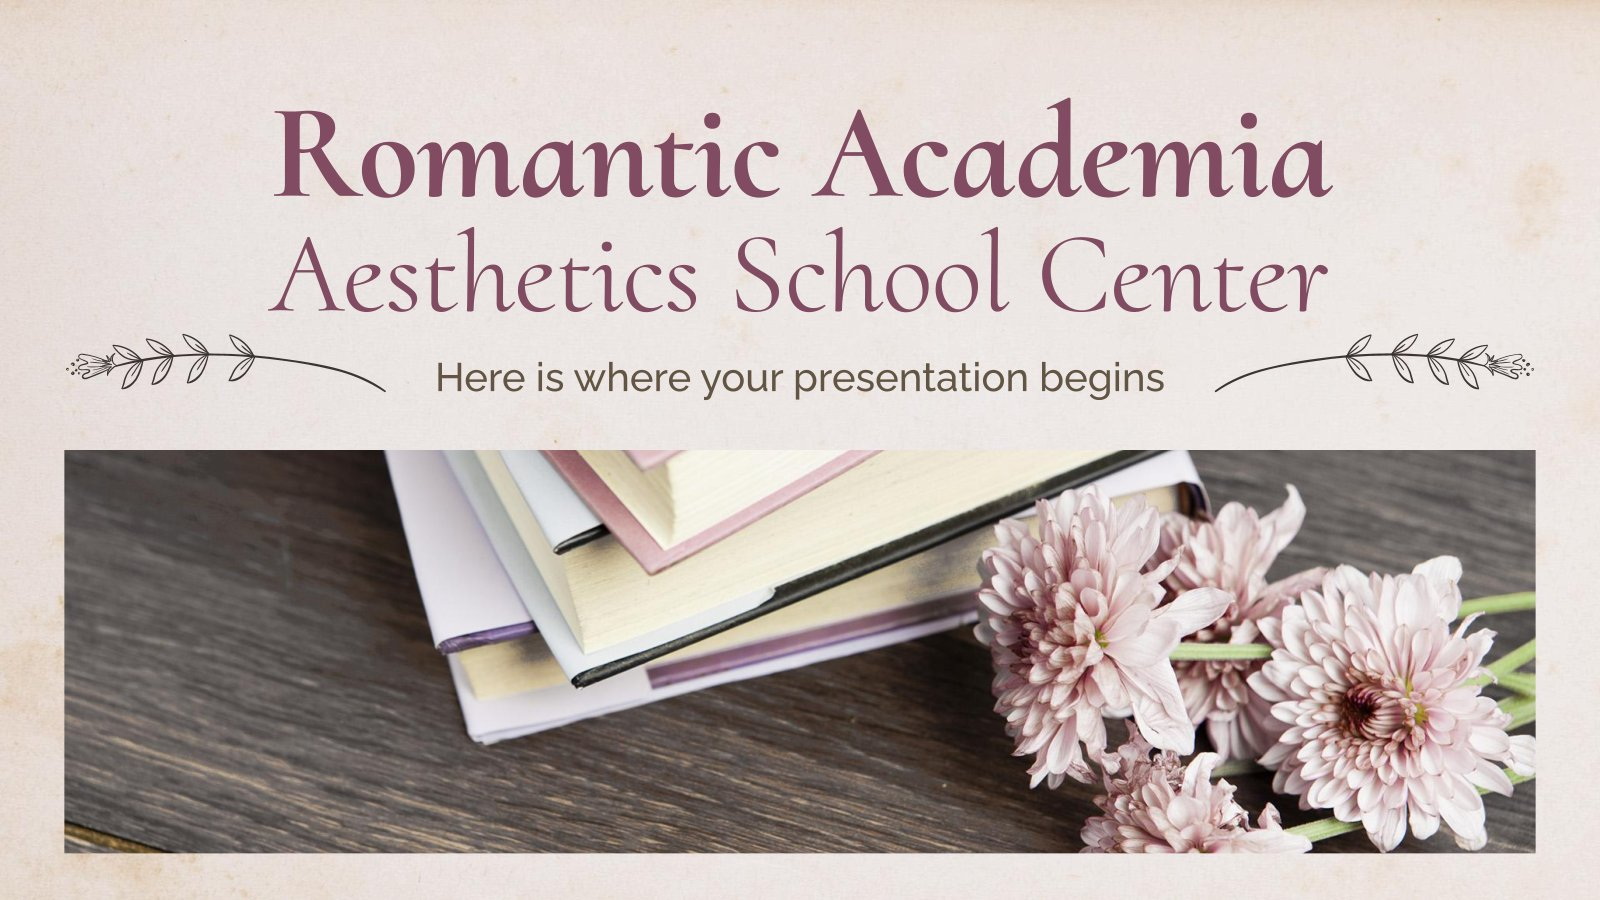 Romantic Academia Aesthetics School Center presentation template